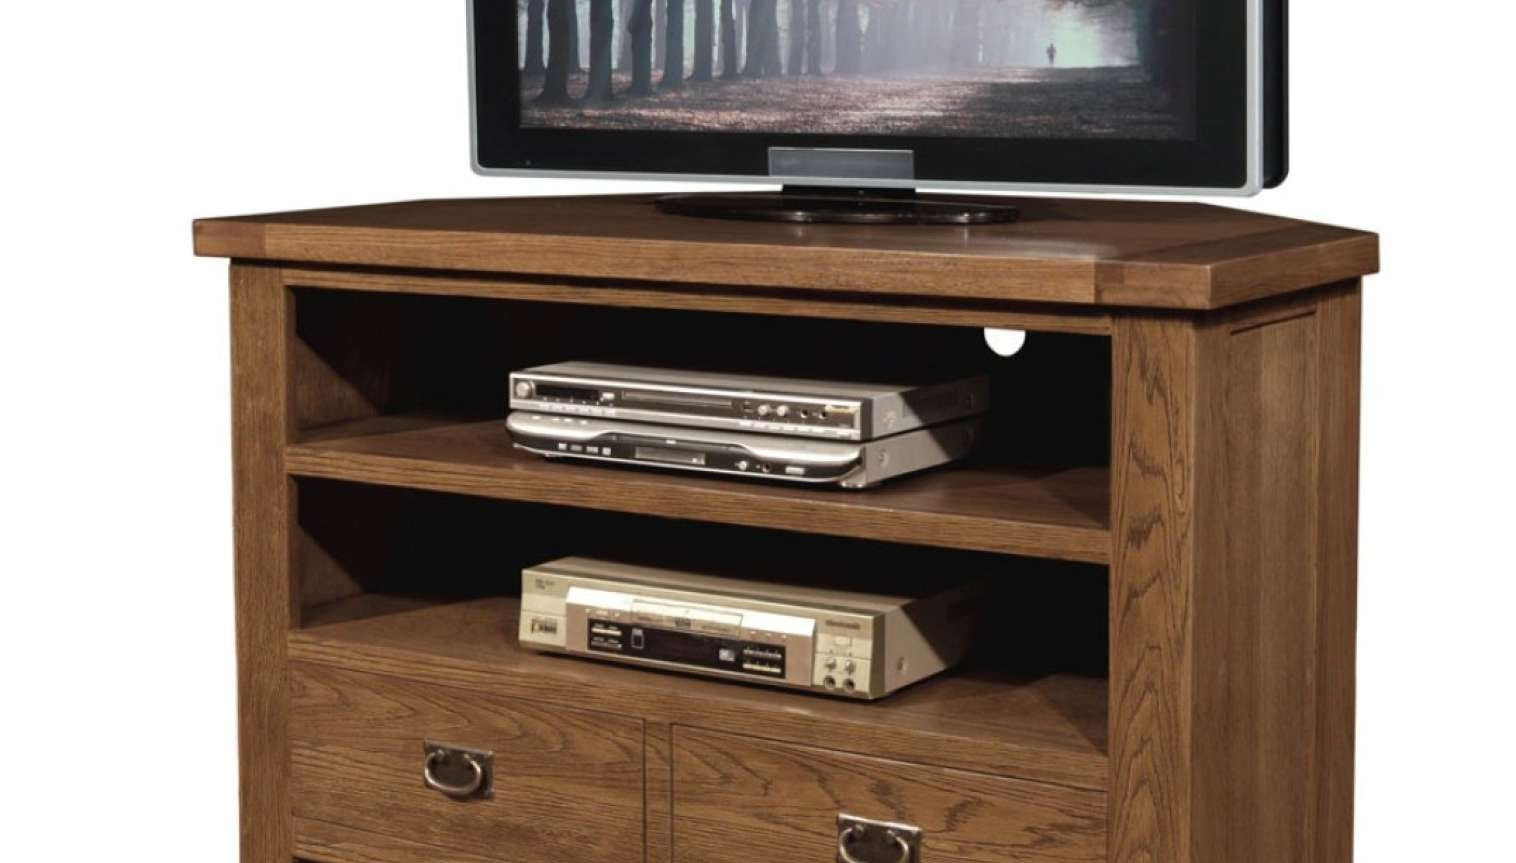 Tv : Diy Tv Wonderful Maple Wood Tv Stands Build Your Own Diy Tv Within Maple Wood Tv Stands (View 9 of 15)